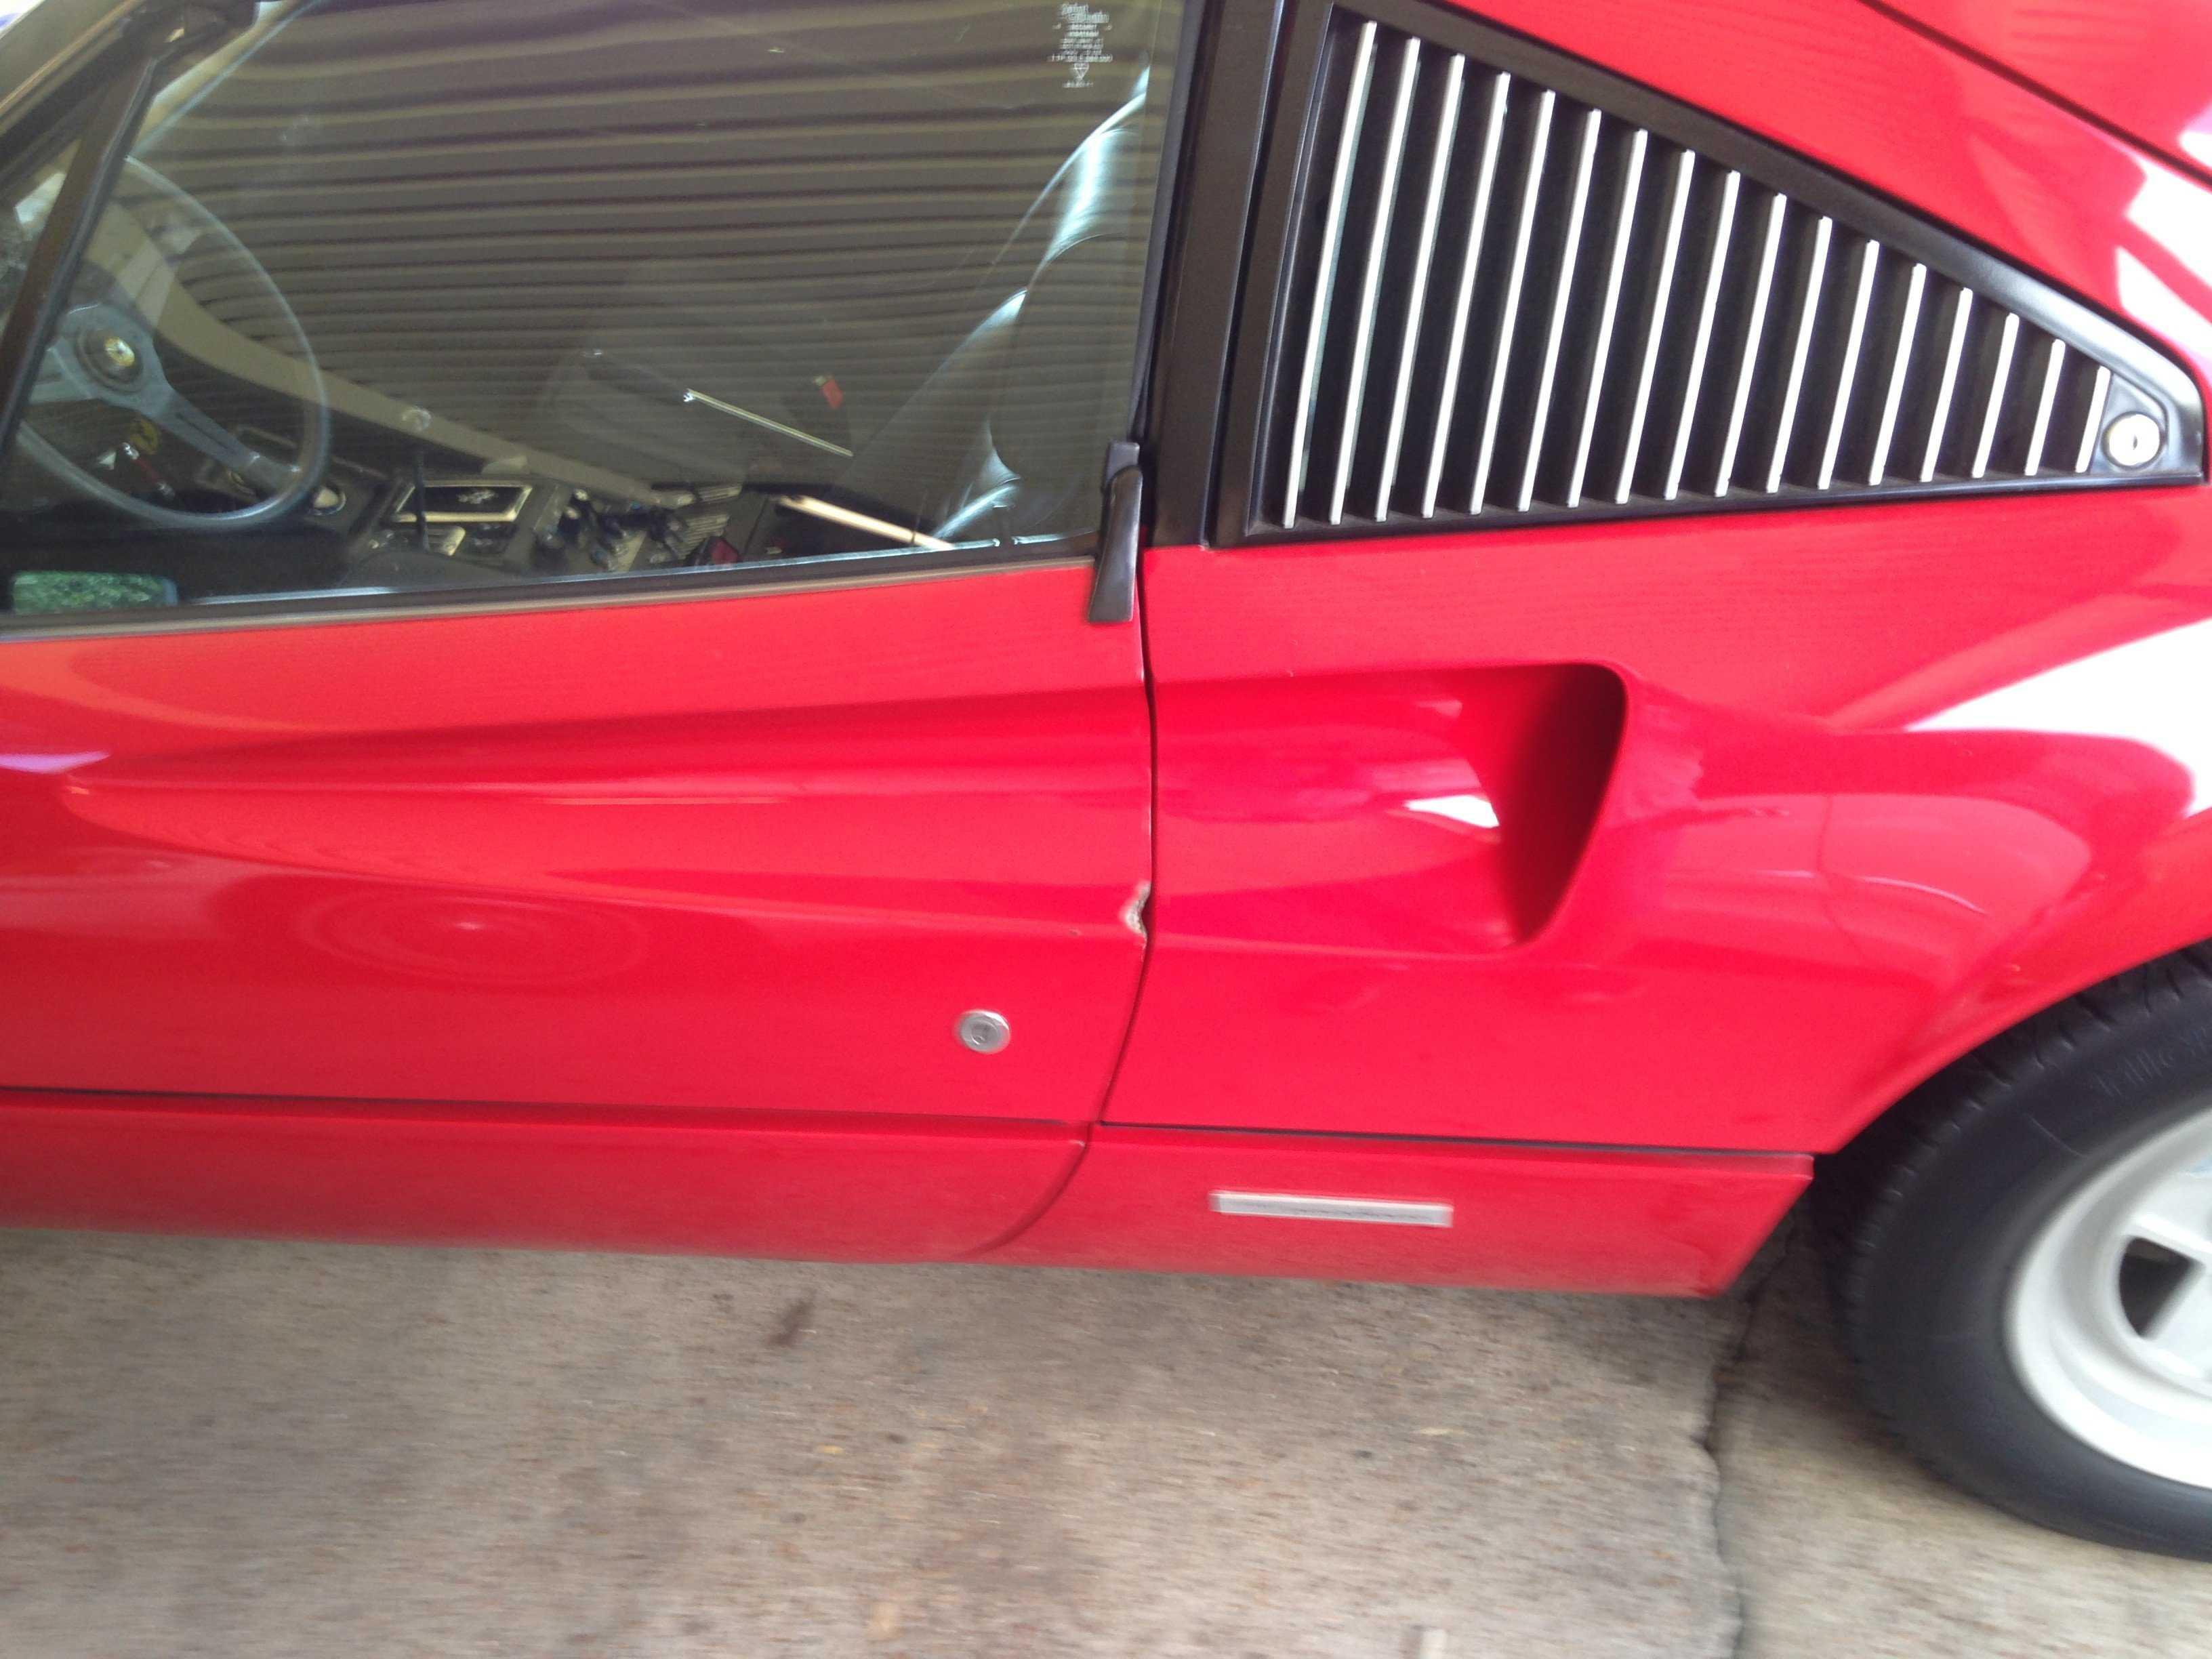 1980 Ferrari 308 For Sale In Port Arthur Tx Zffaa02a8a0033659 Fuse Box